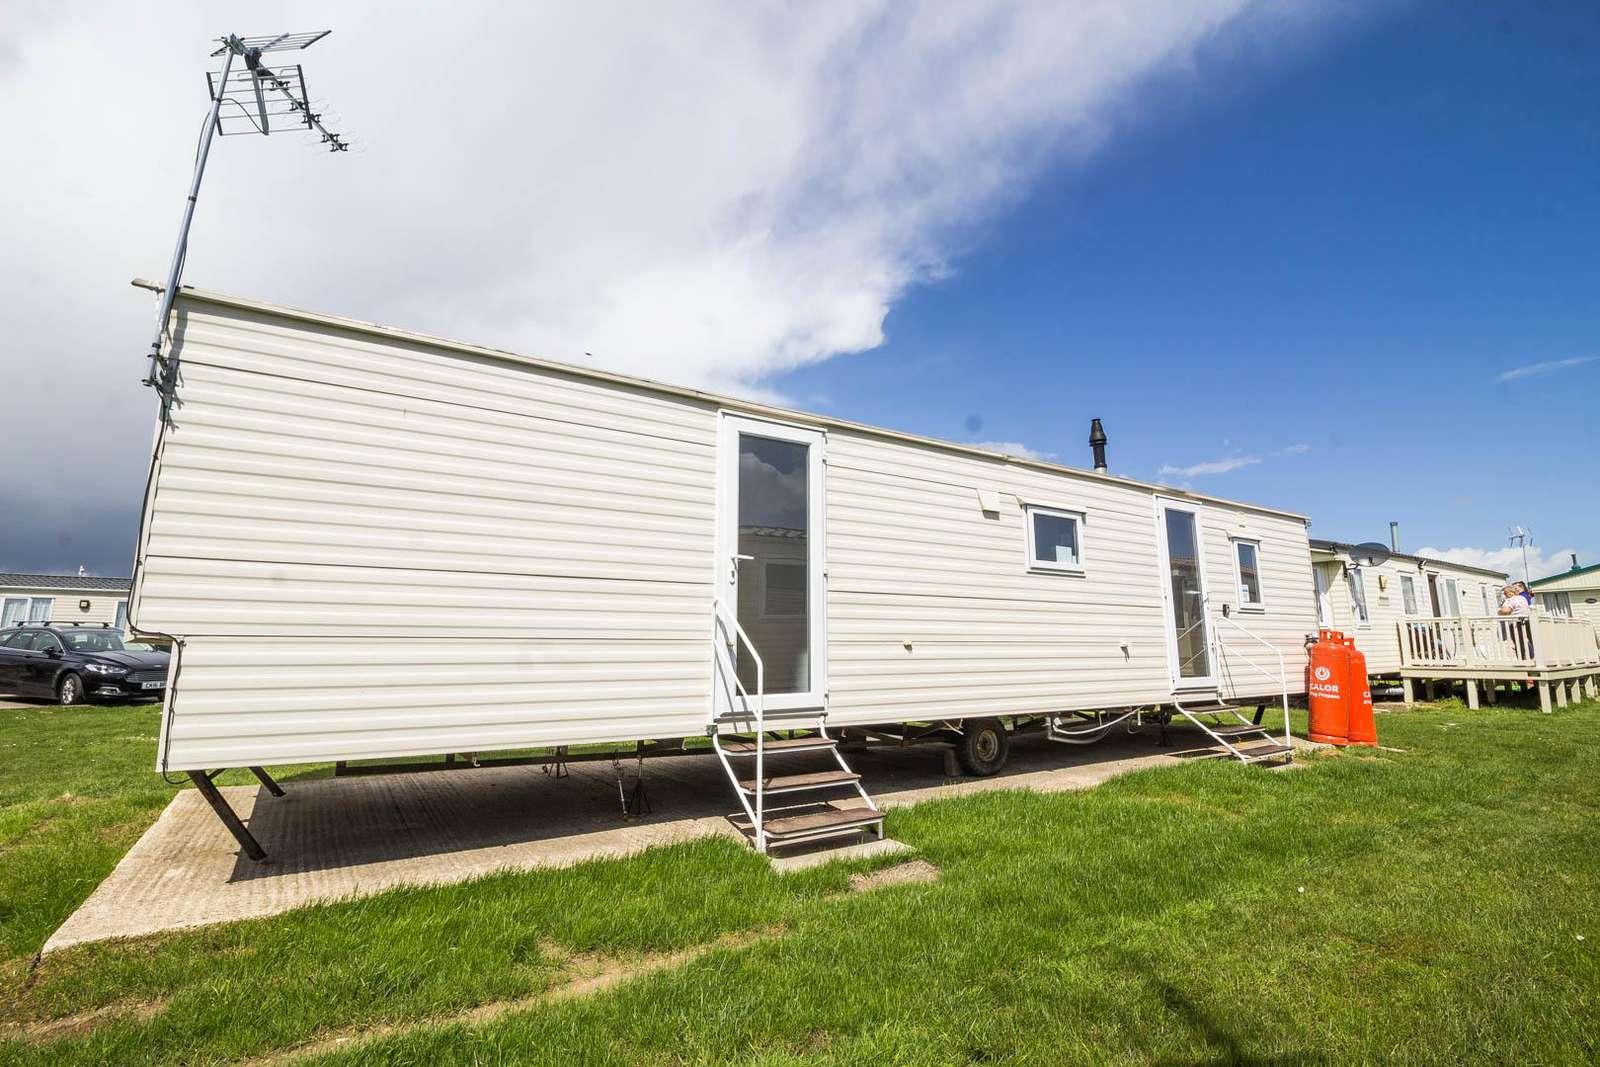 28002GC – Gainsborough Close area, 3 bed, 8 berth caravan with D/G & C/H. Ruby rated. - property